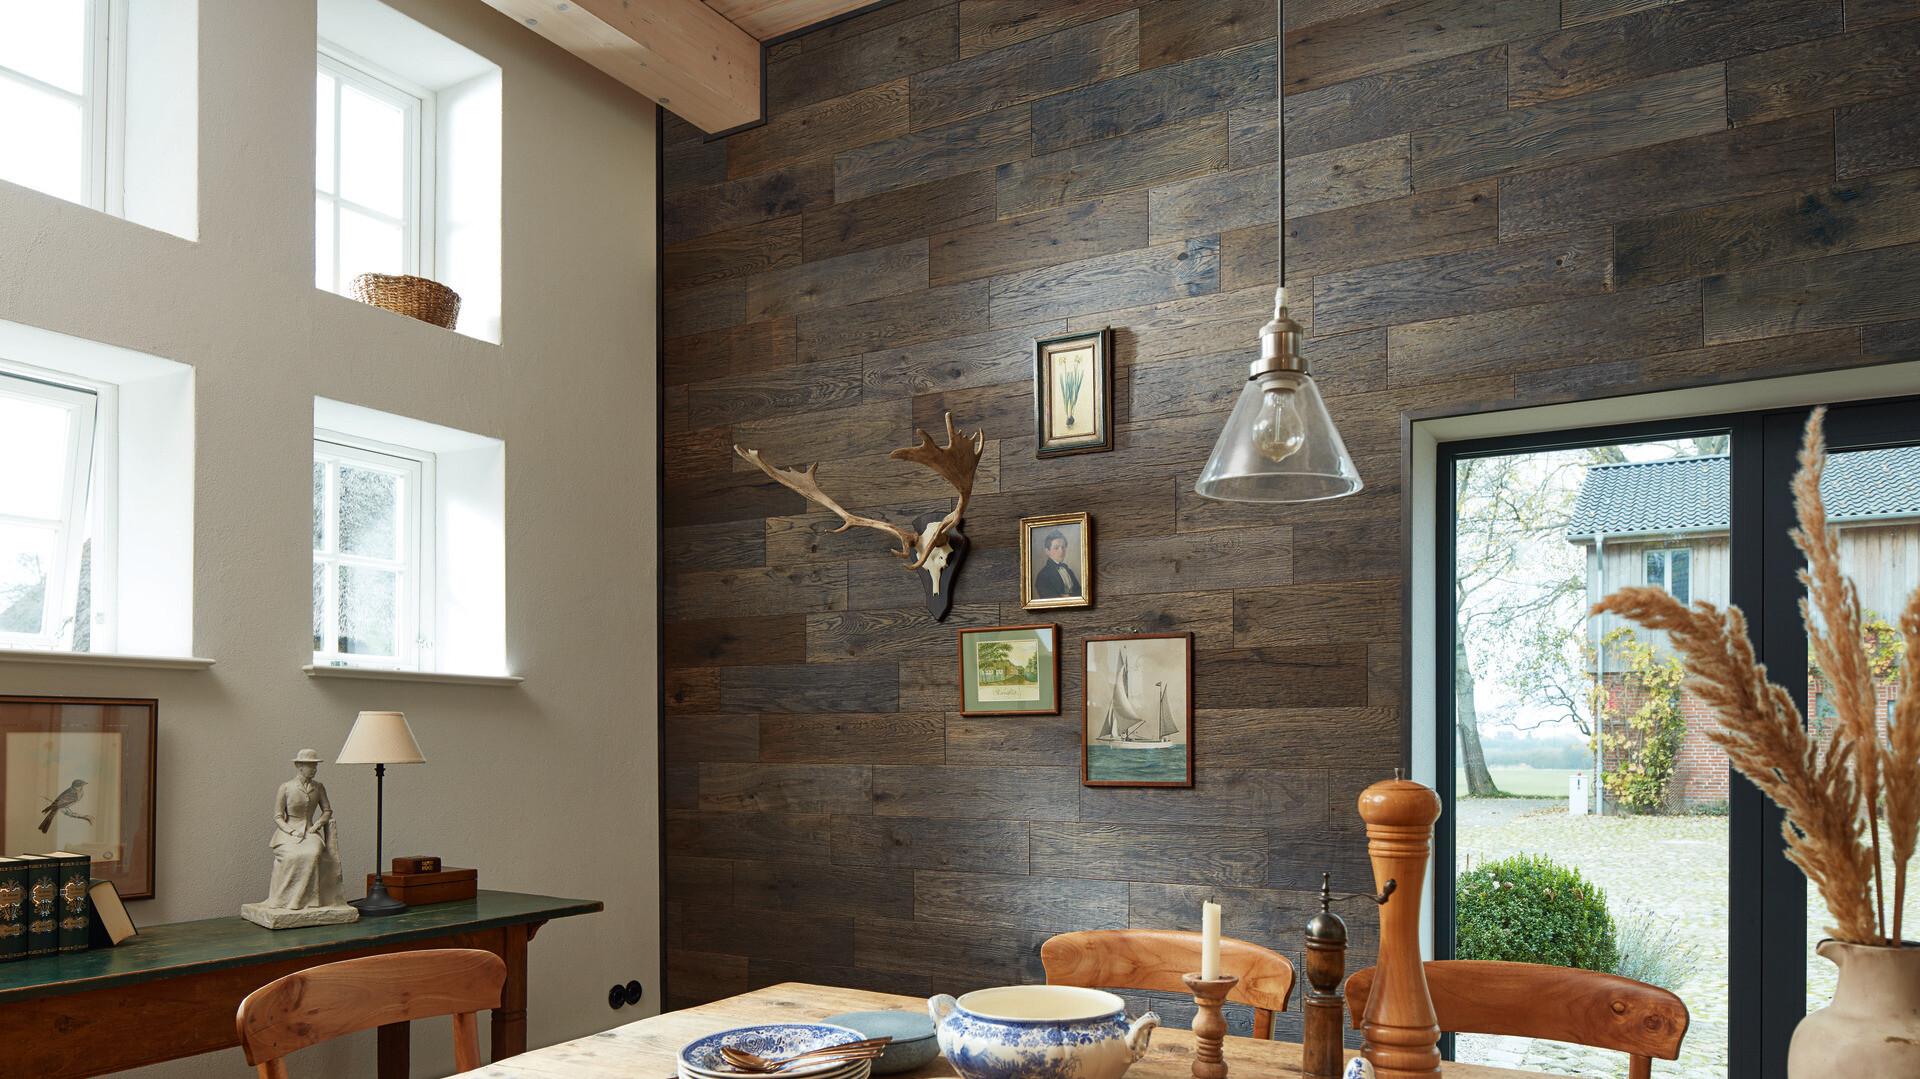 Holzpaneele in Altholzoptik an der Wand